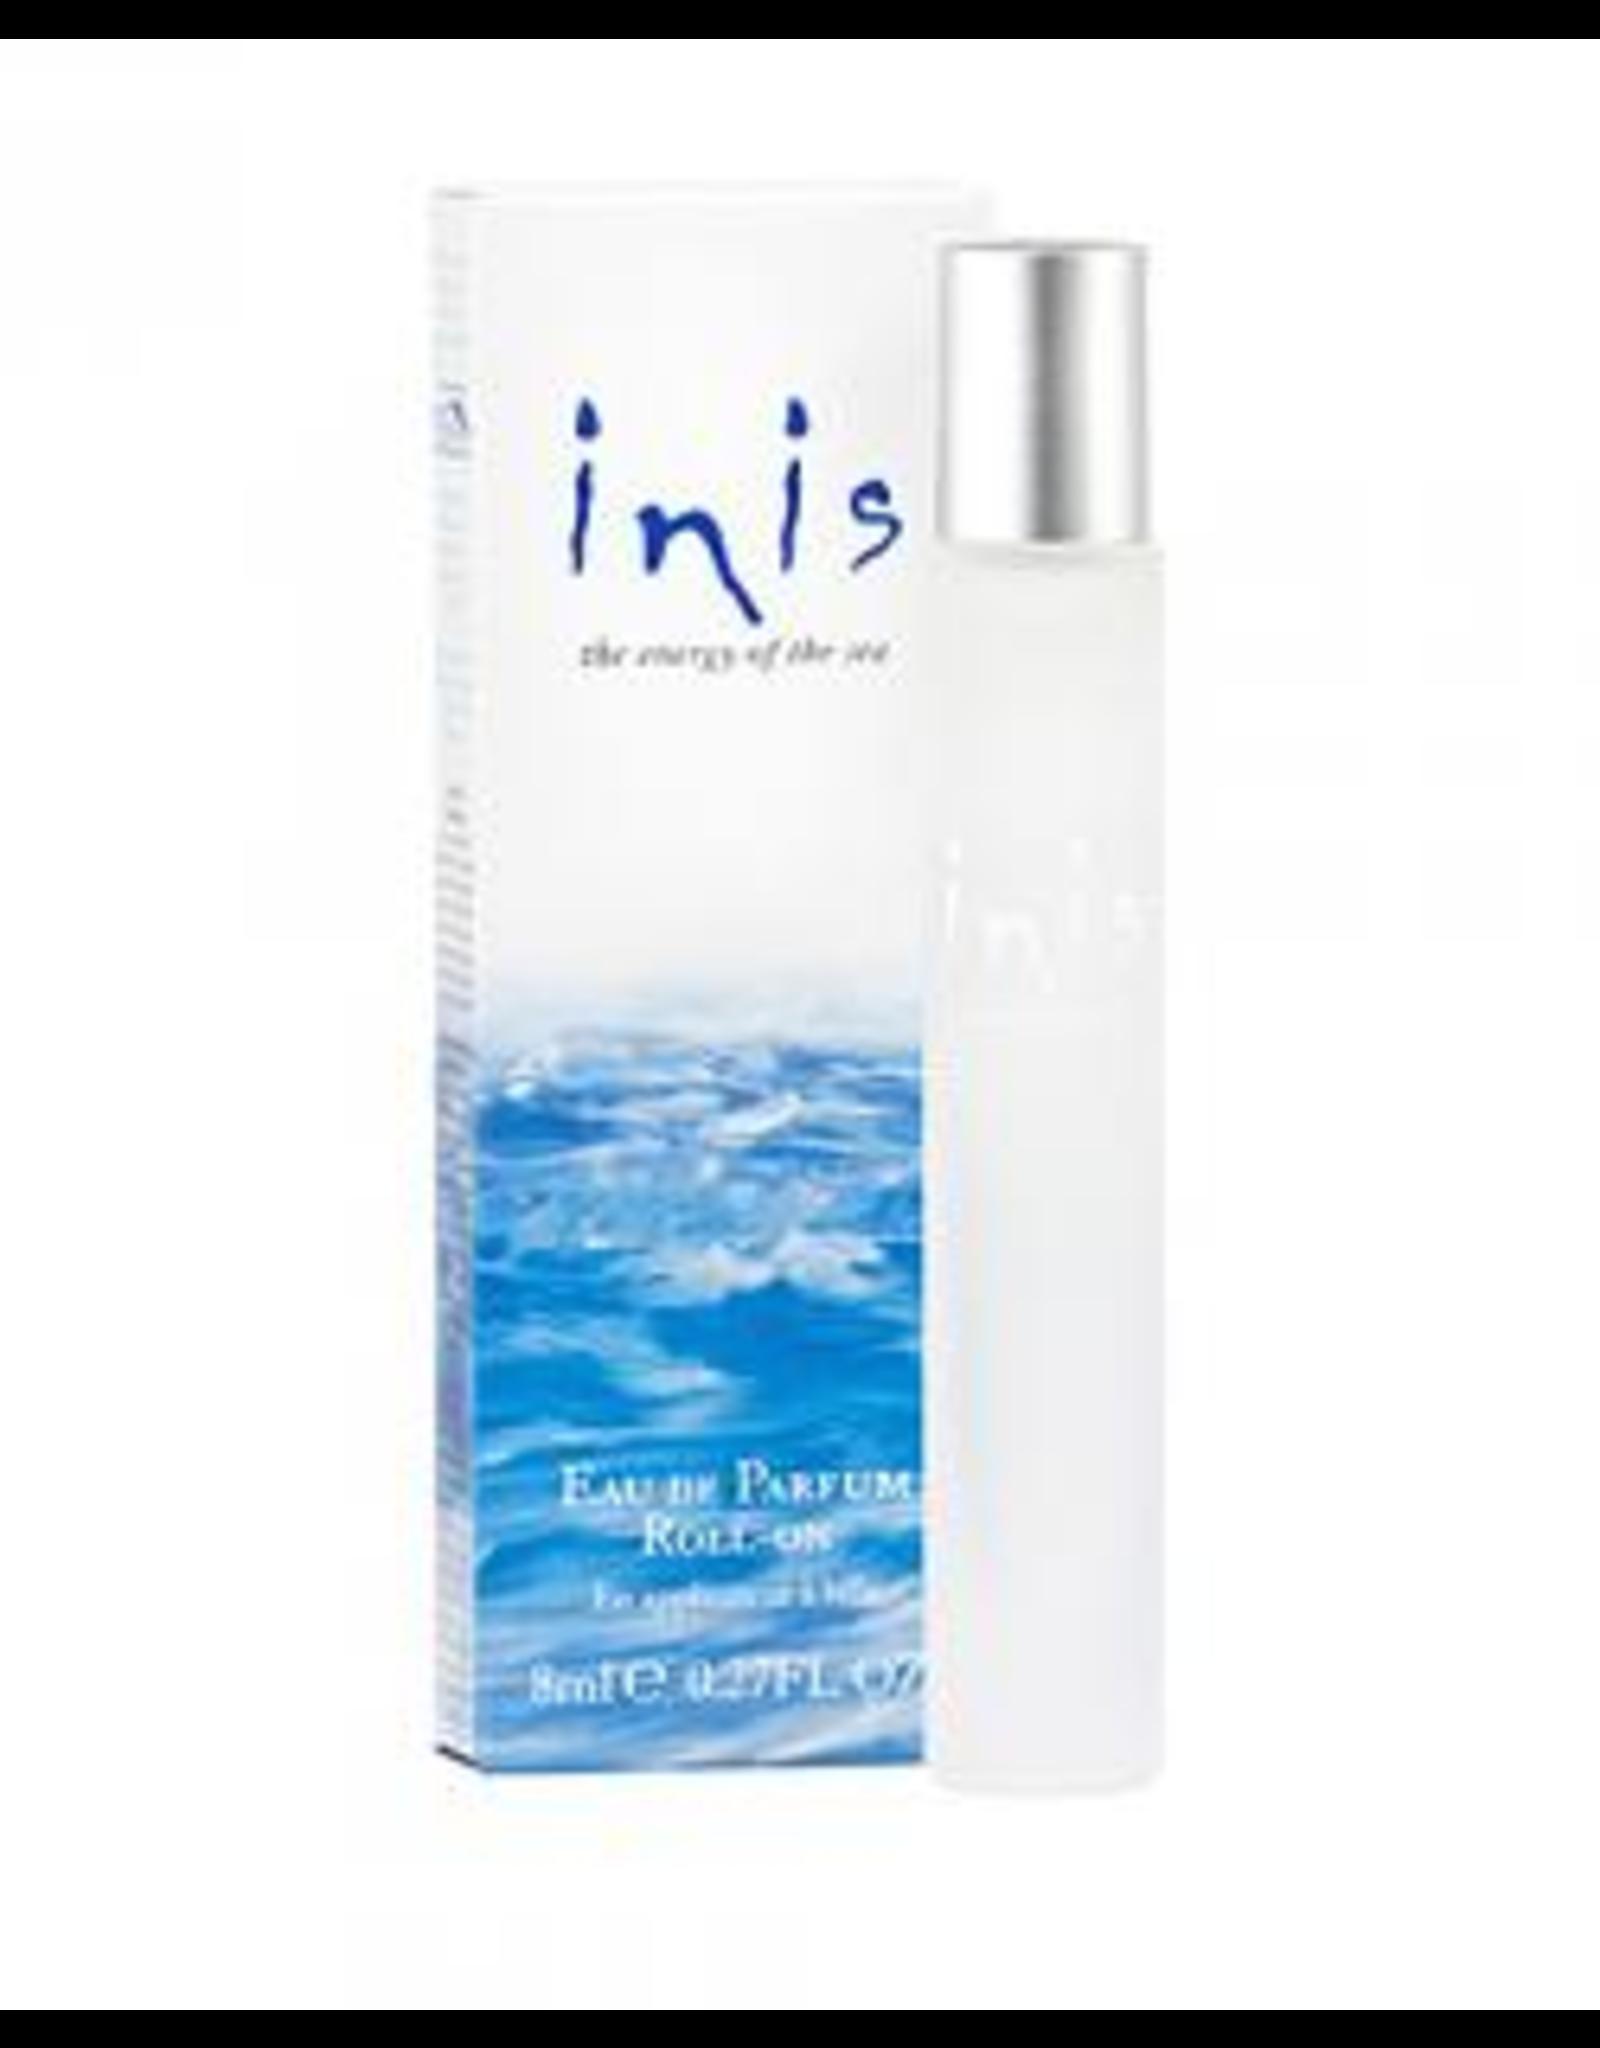 Fragrances of Ireland Ltd. Inis Energy of the Sea Roll-on